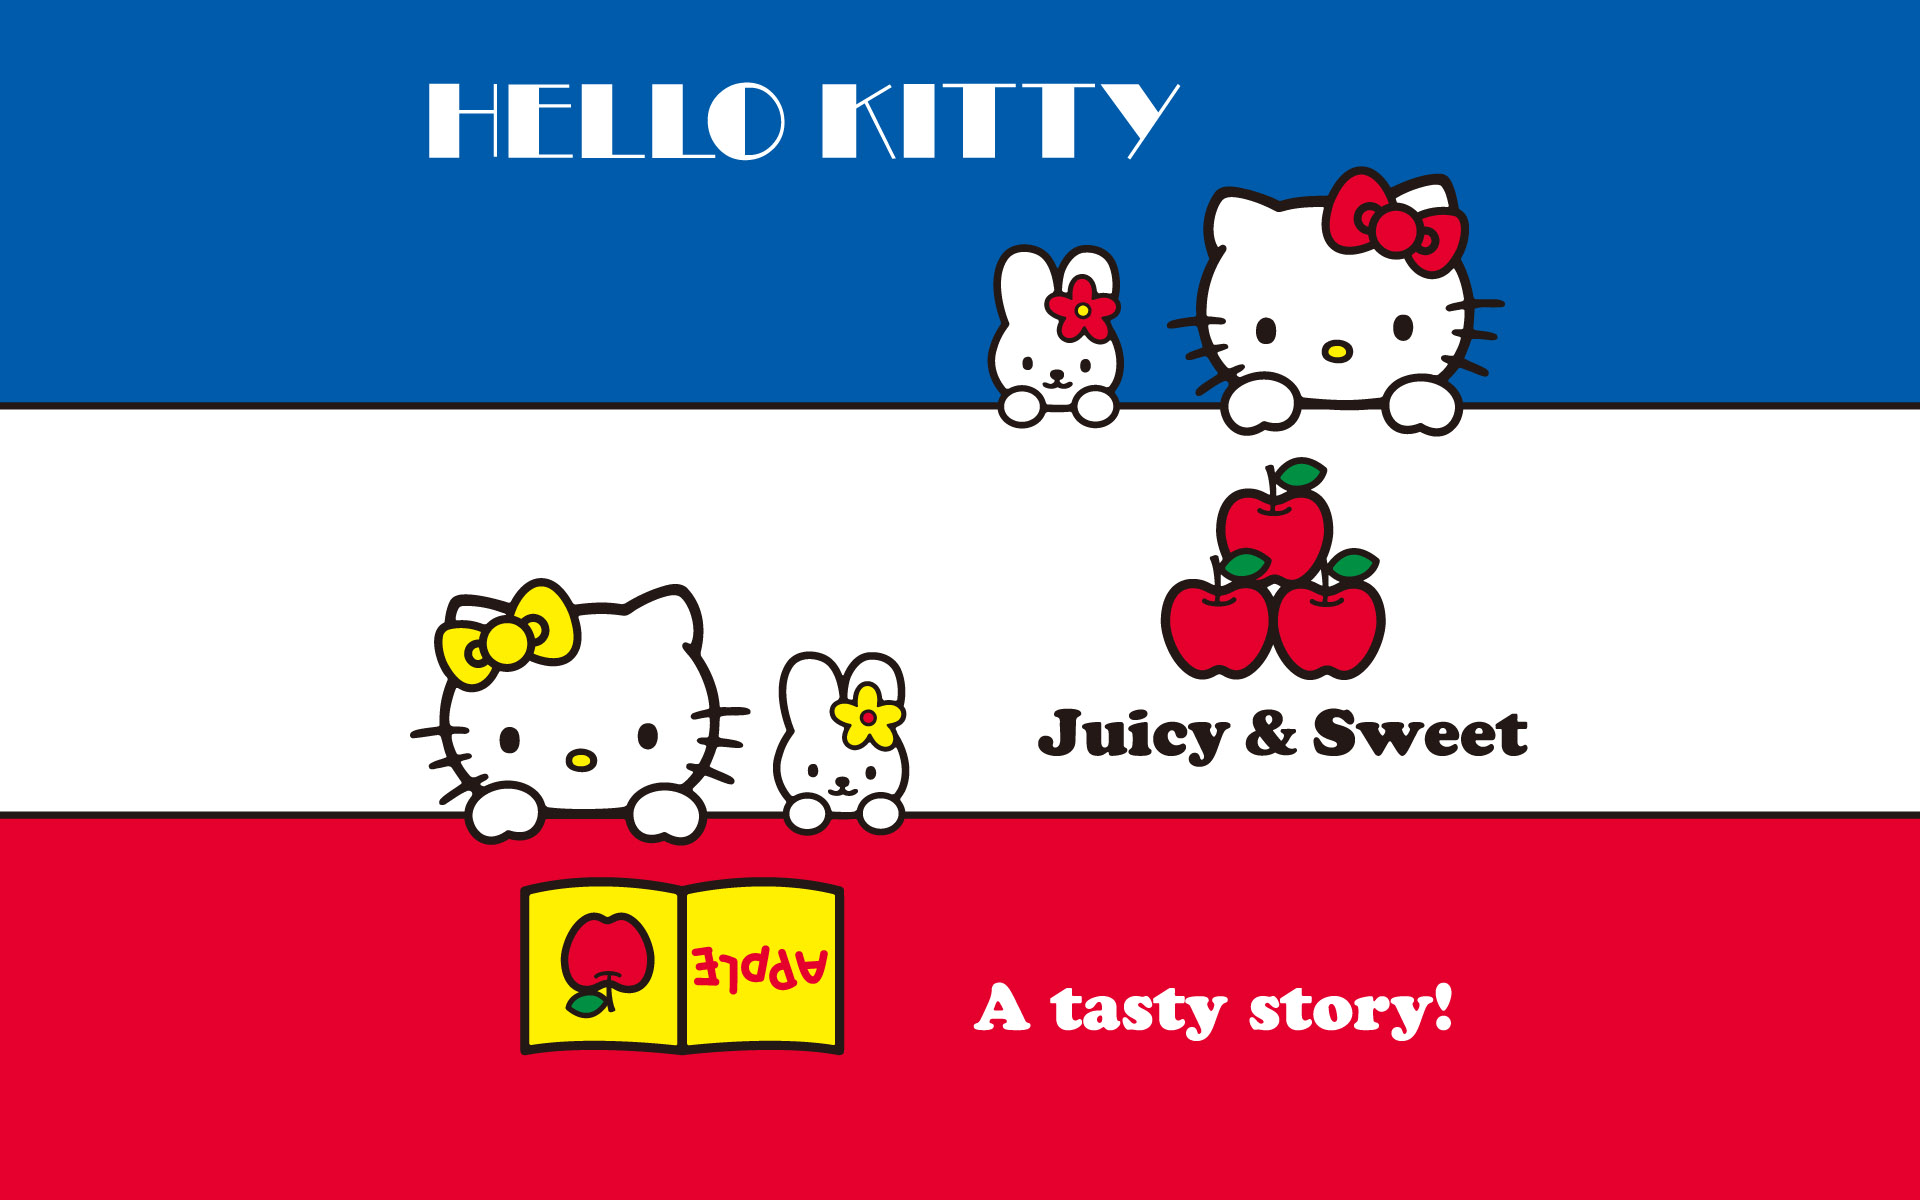 Hello Kitty Holland Flag - Hello Kitty Holland Flag